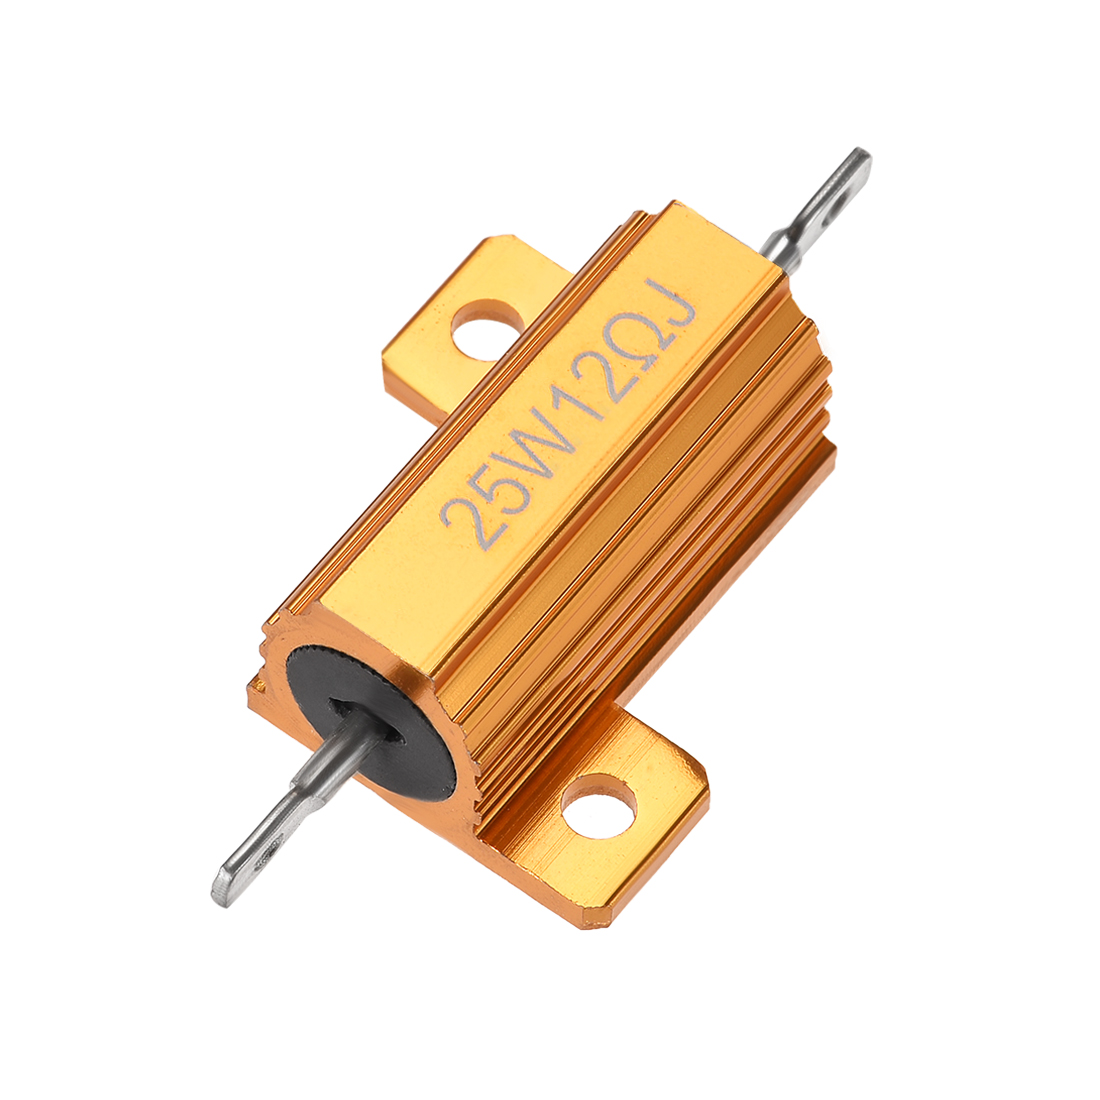 25 Watt 12 Ohm 5% Aluminum Housing Resistor Wirewound Resistor Gold Tone